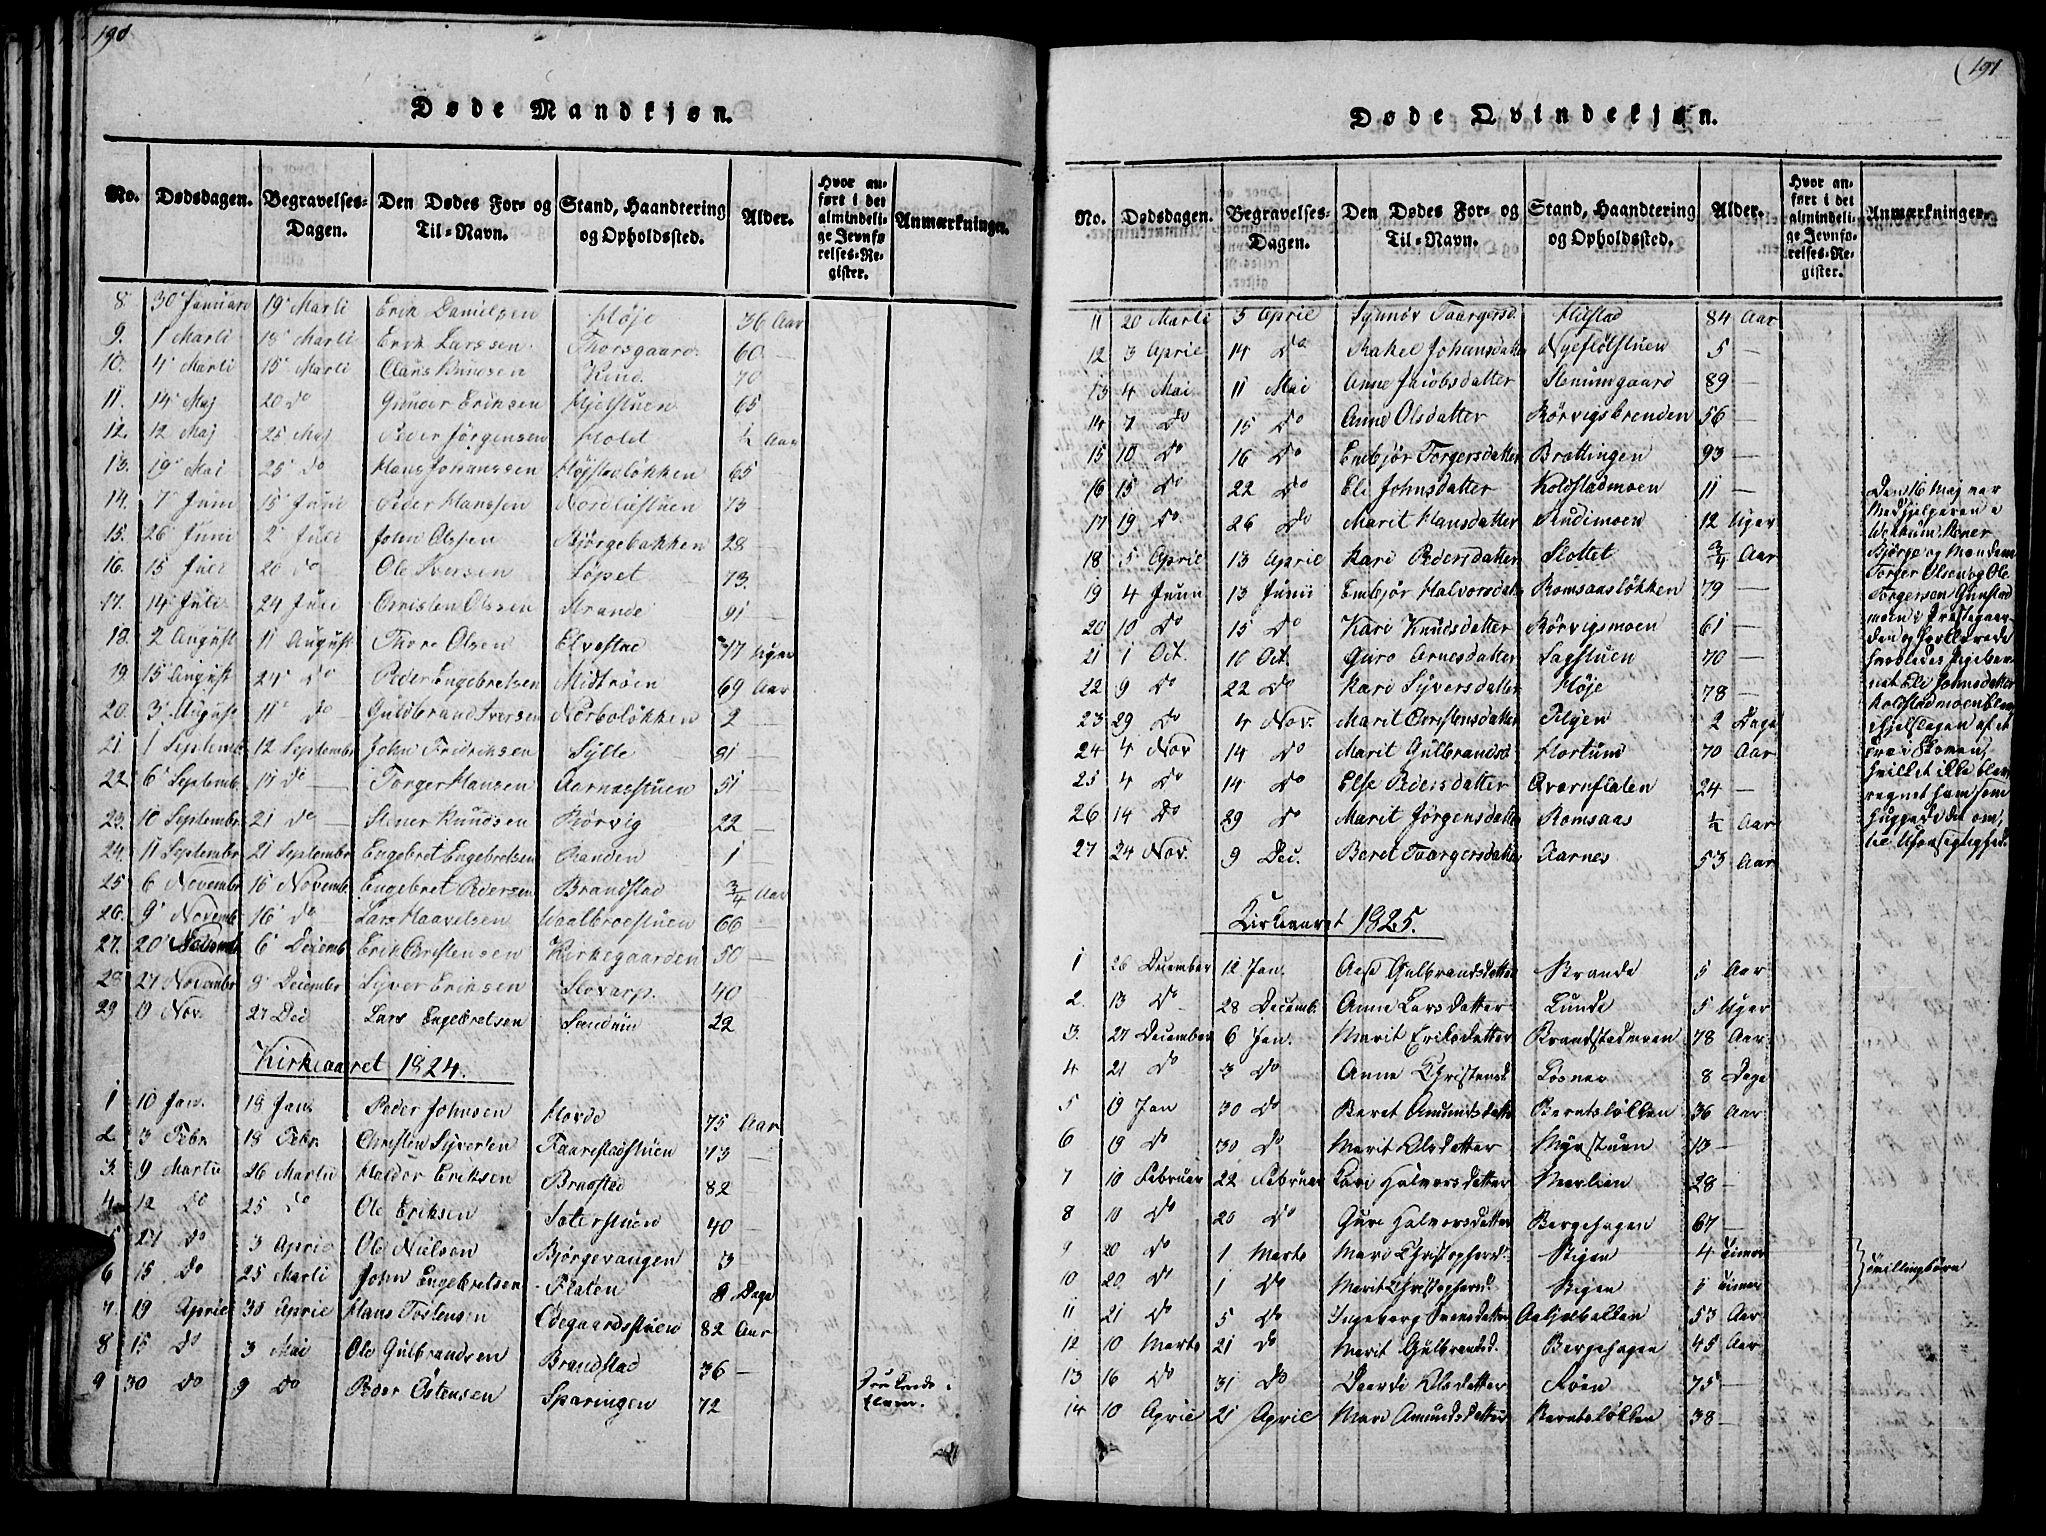 SAH, Ringebu prestekontor, Ministerialbok nr. 4, 1821-1839, s. 190-191